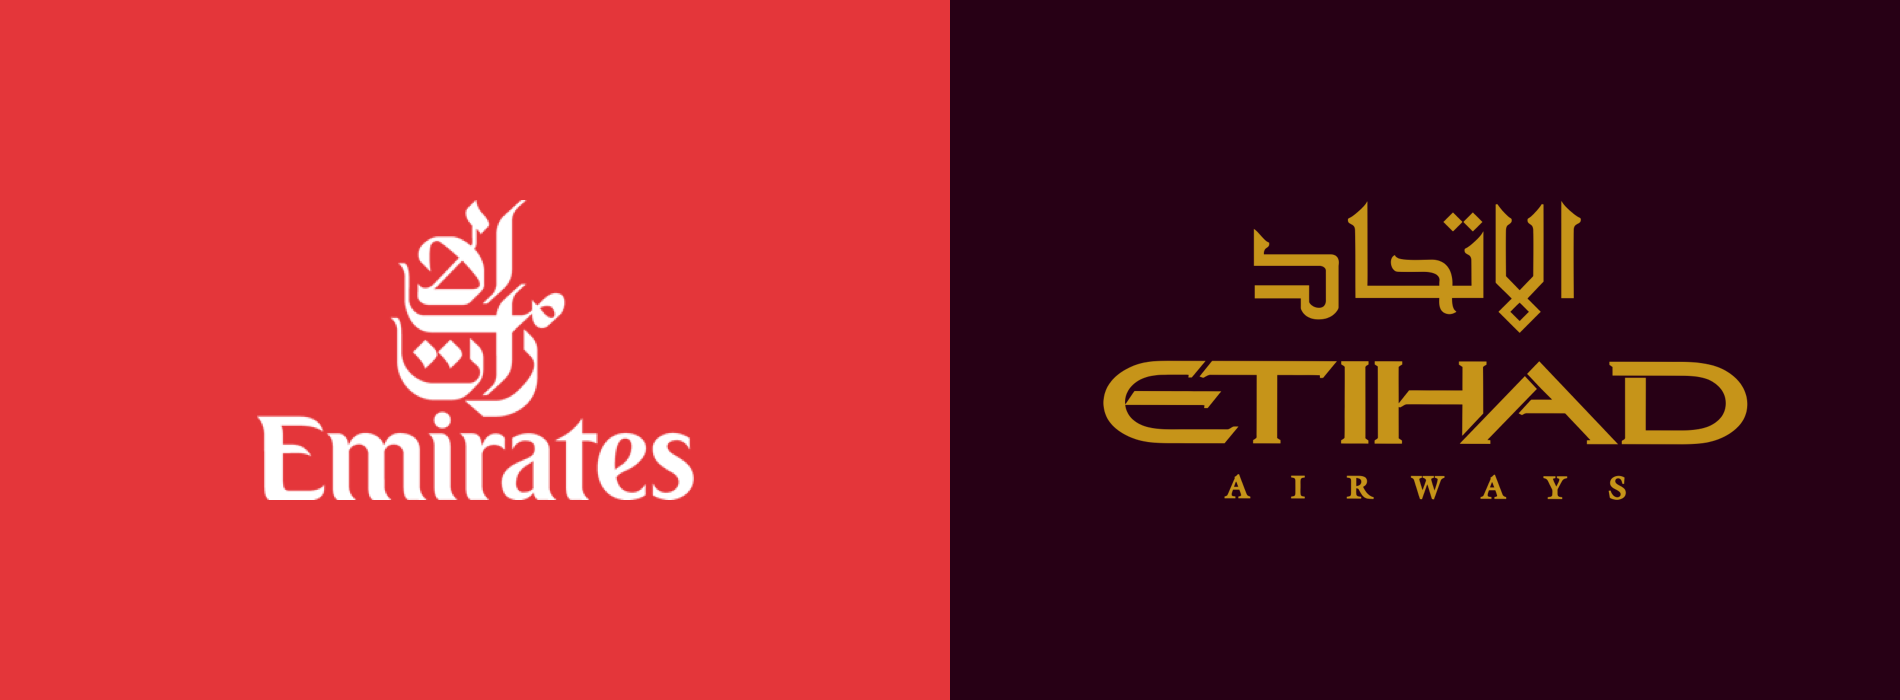 Emirates vs Etihad: A Booking Process Comparison